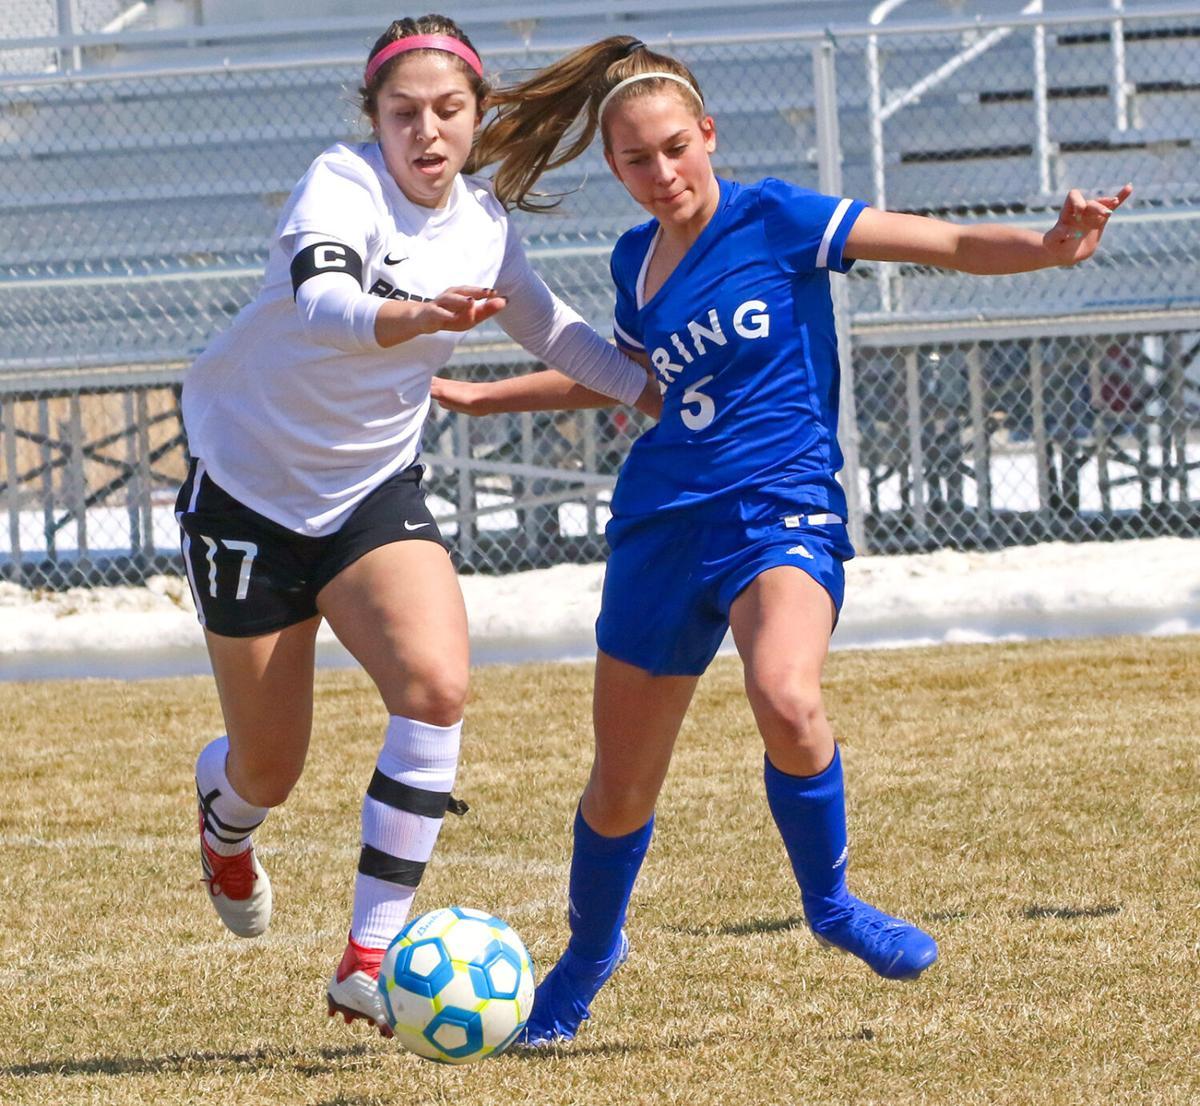 Scottsbluff girls soccer team shuts out Gering 6-0